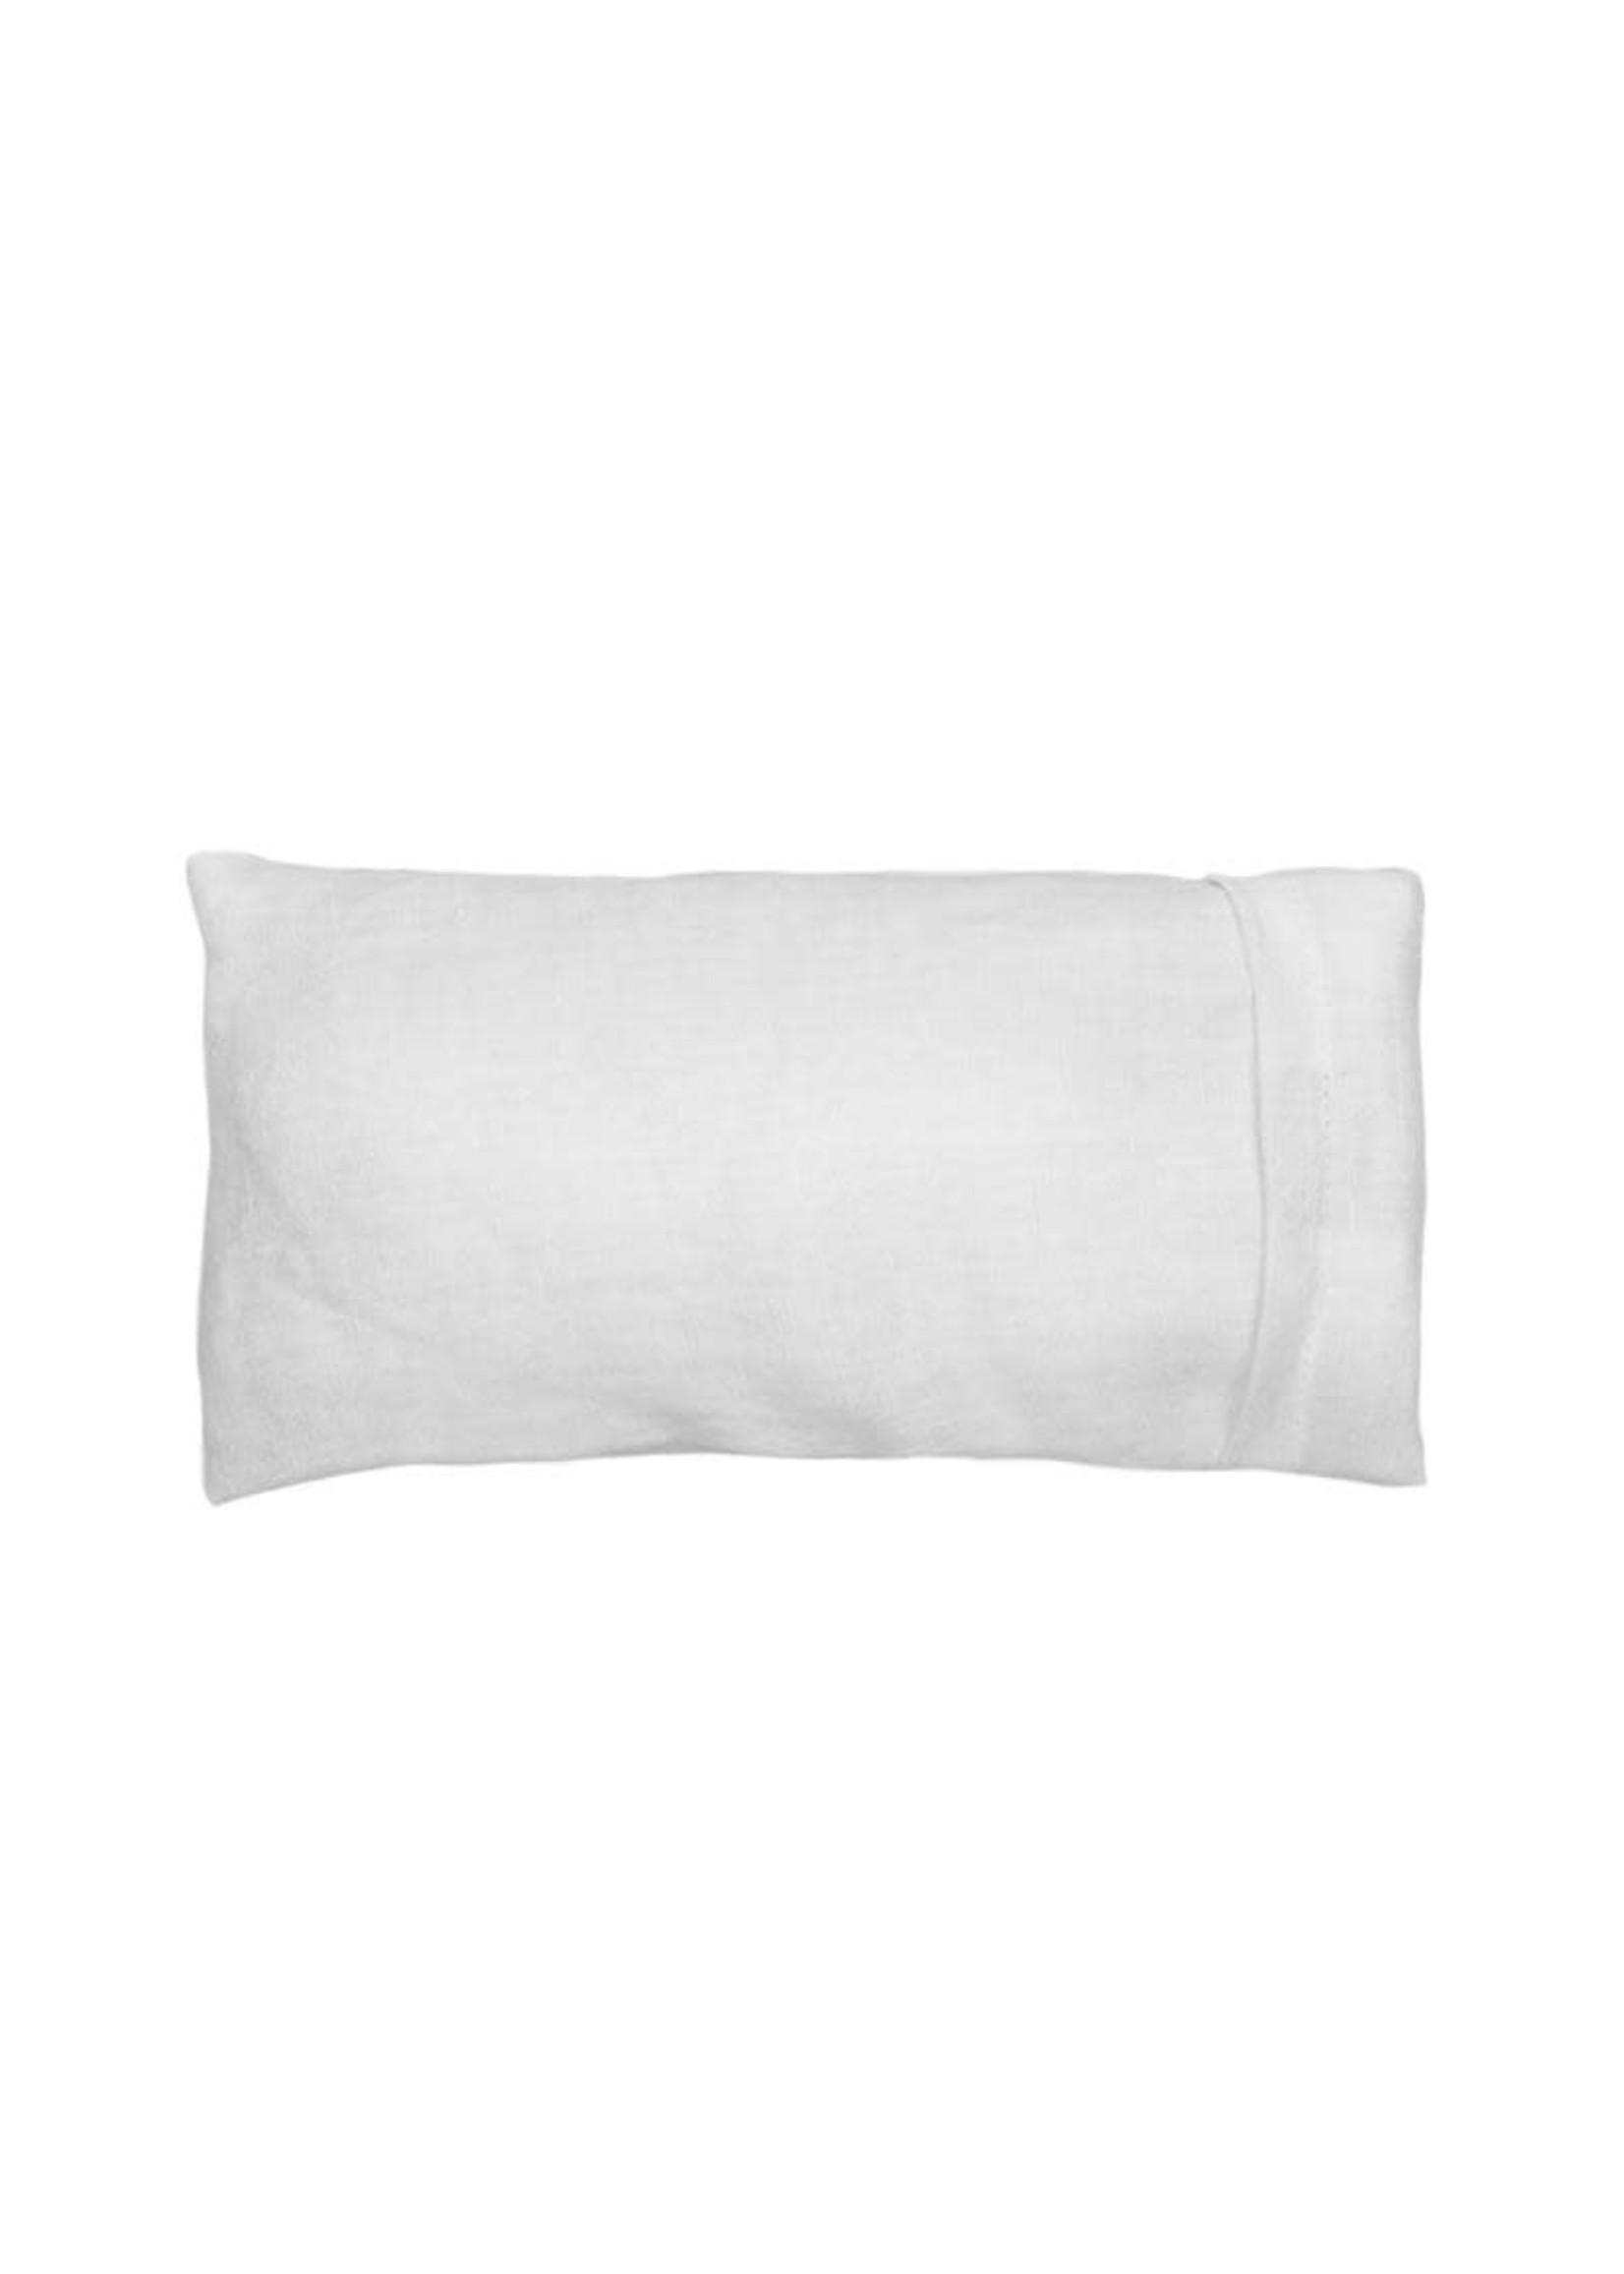 Elizabeth W Eye Pillow -Washed Linen Ivory